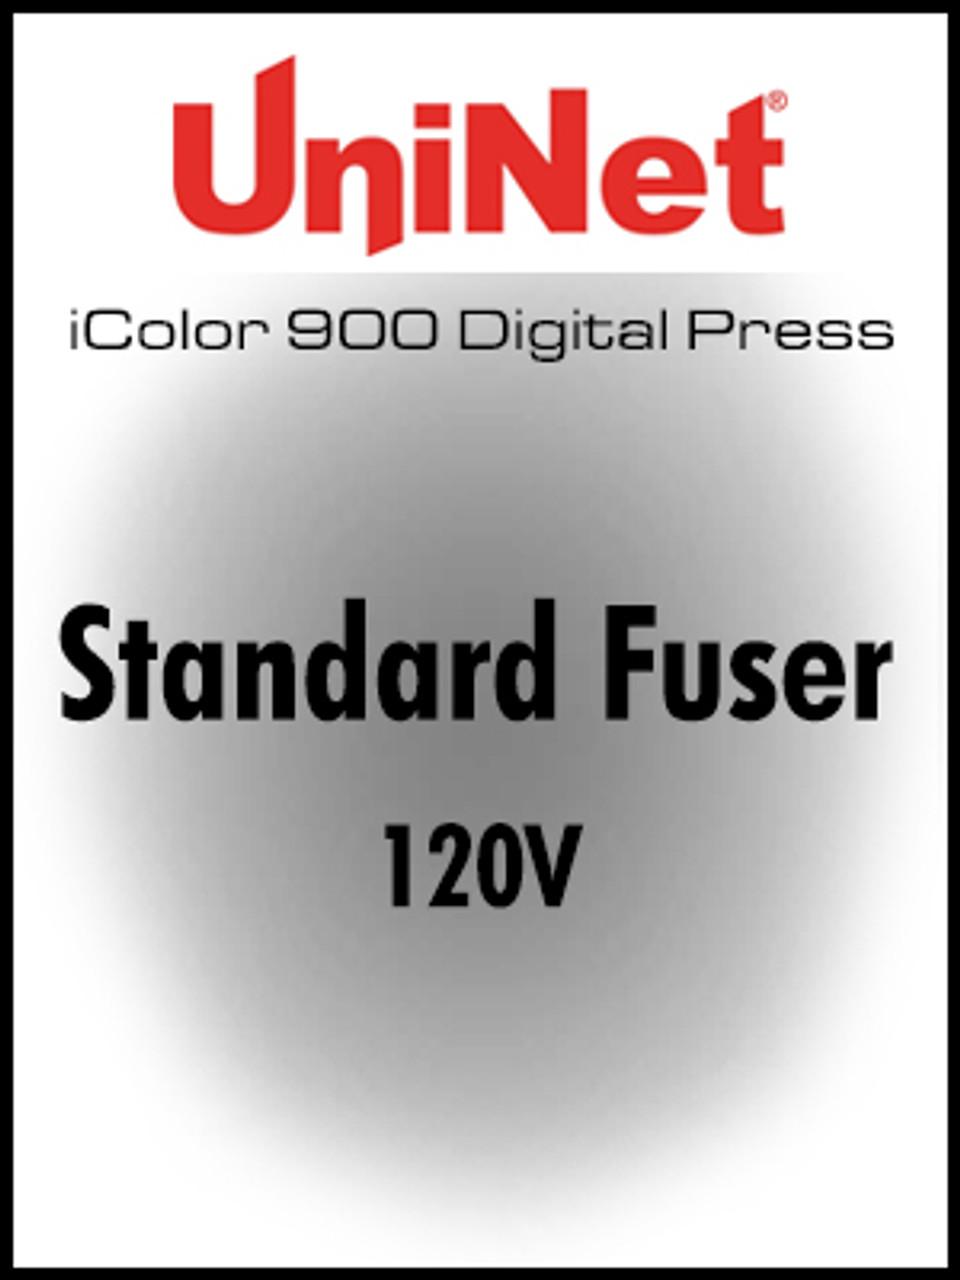 iColor 900 Digital Press Standard Fuser 120V